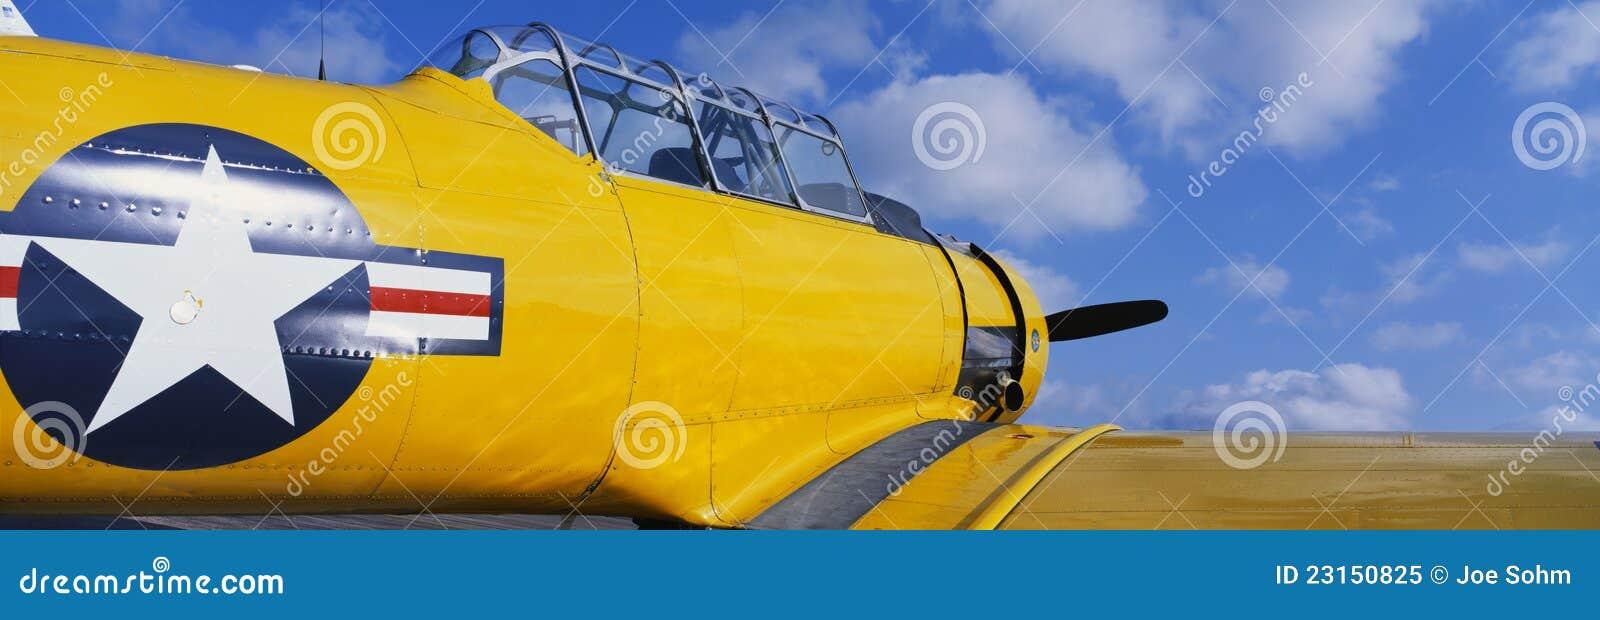 Aeroplano amarillo de la Segunda Guerra Mundial de la vendimia